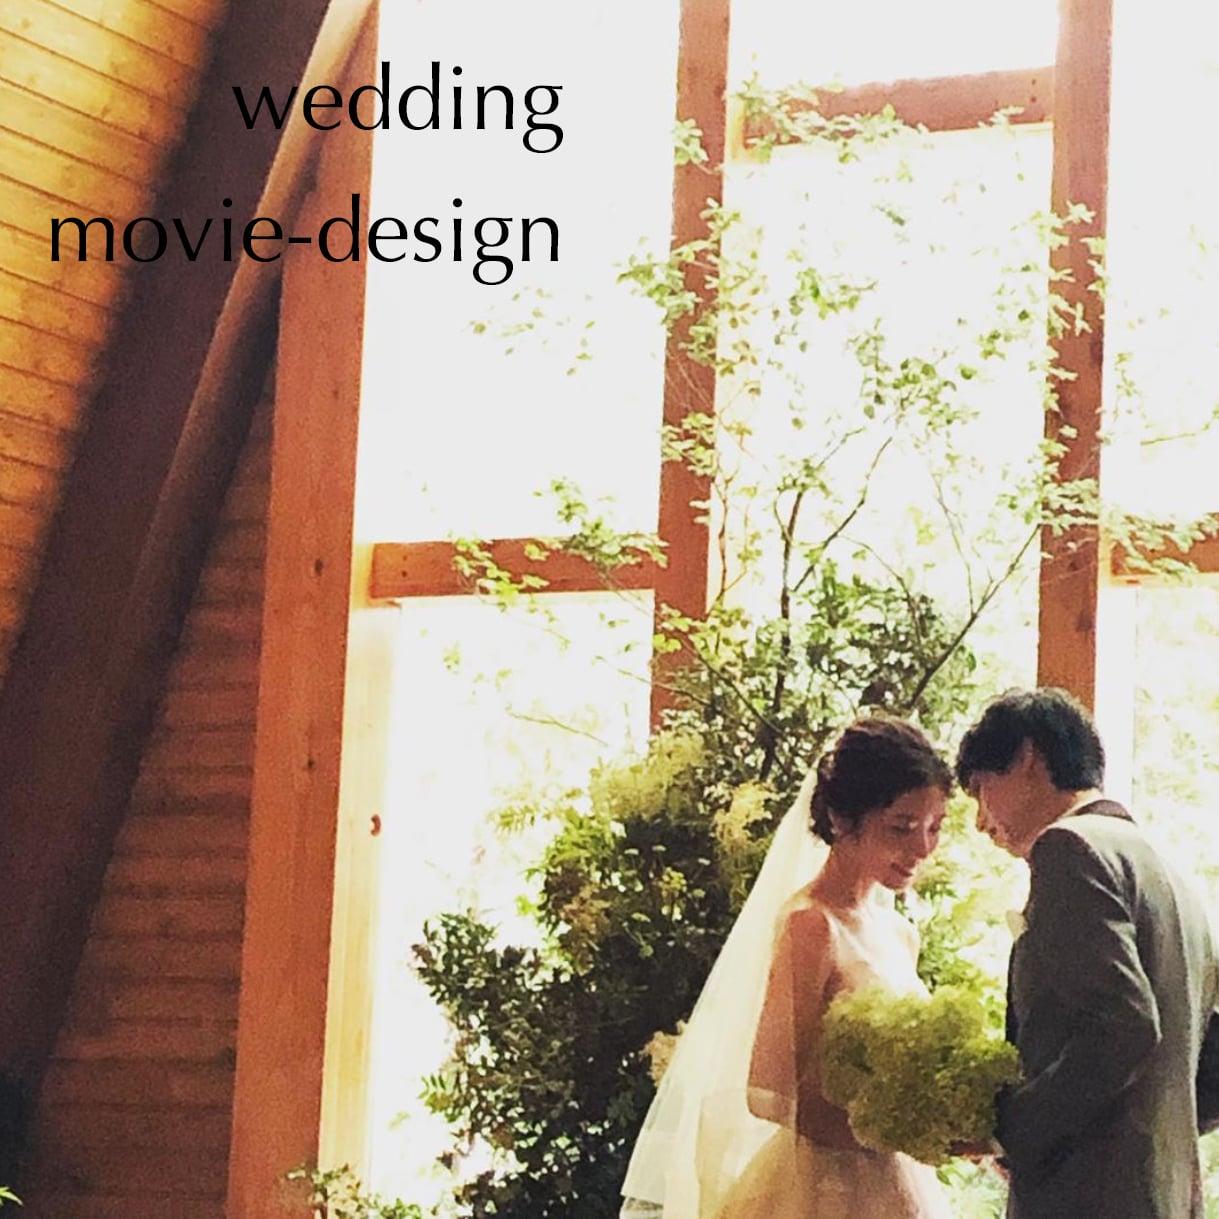 Wedding movie-design[ウェディングオリジナルムービー制作チケット]のイメージその1